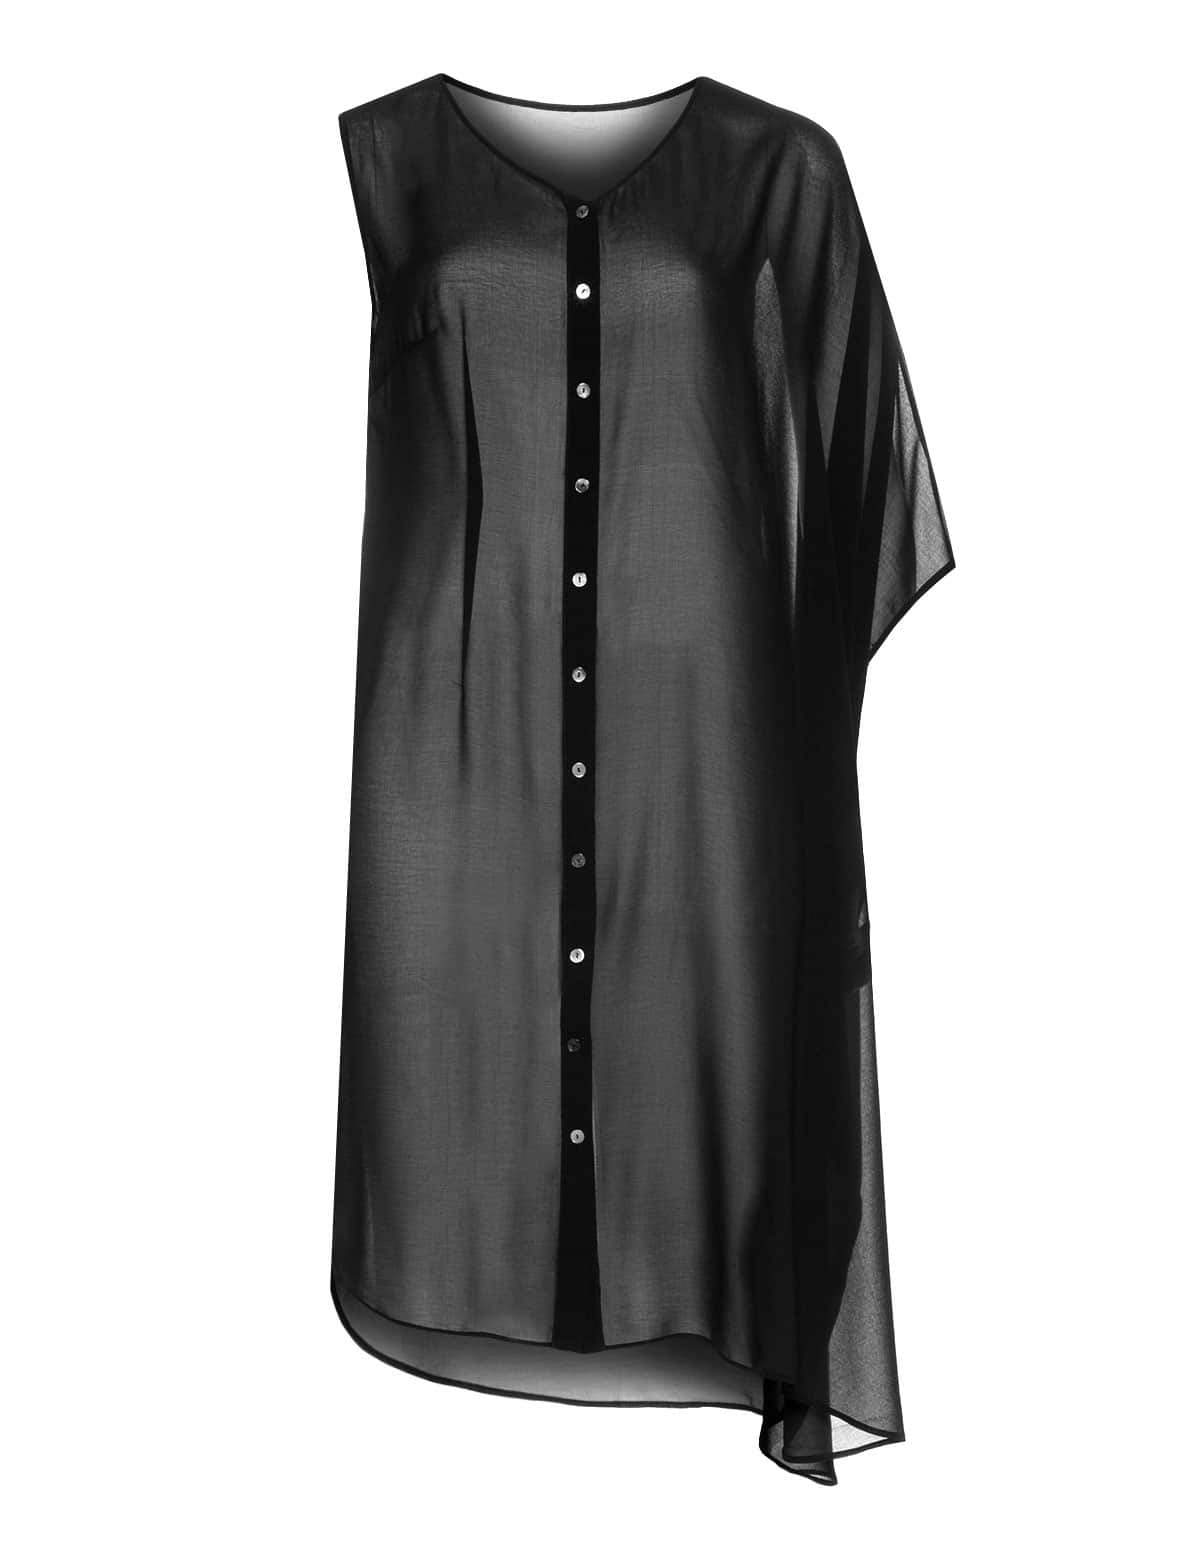 Plus size designer: Manon Baptiste Asymmetrical Dress at Navabi